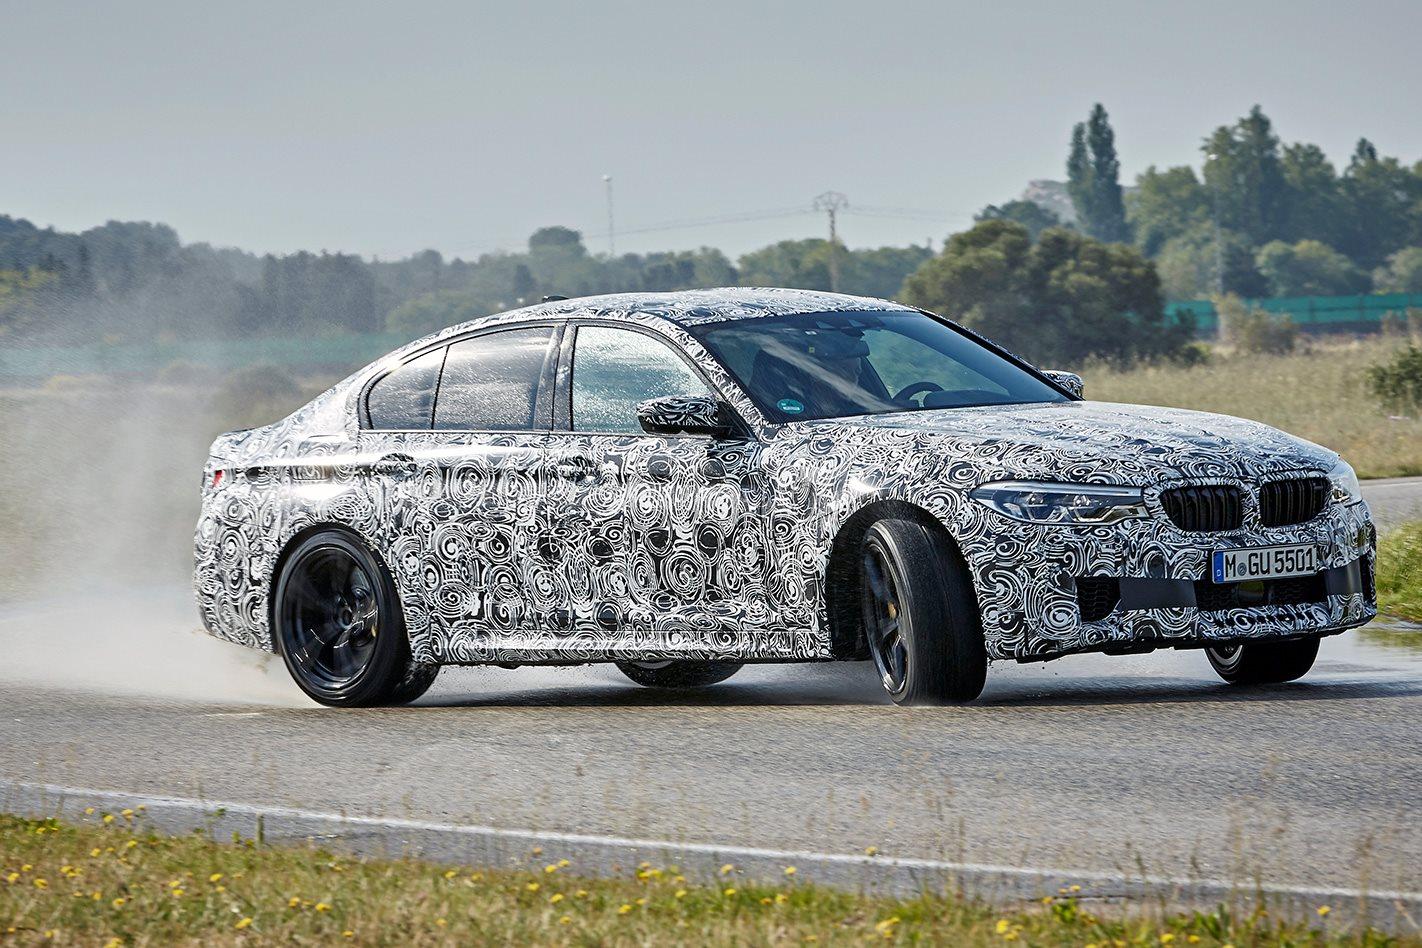 BMW F90 M5 prototype drifting